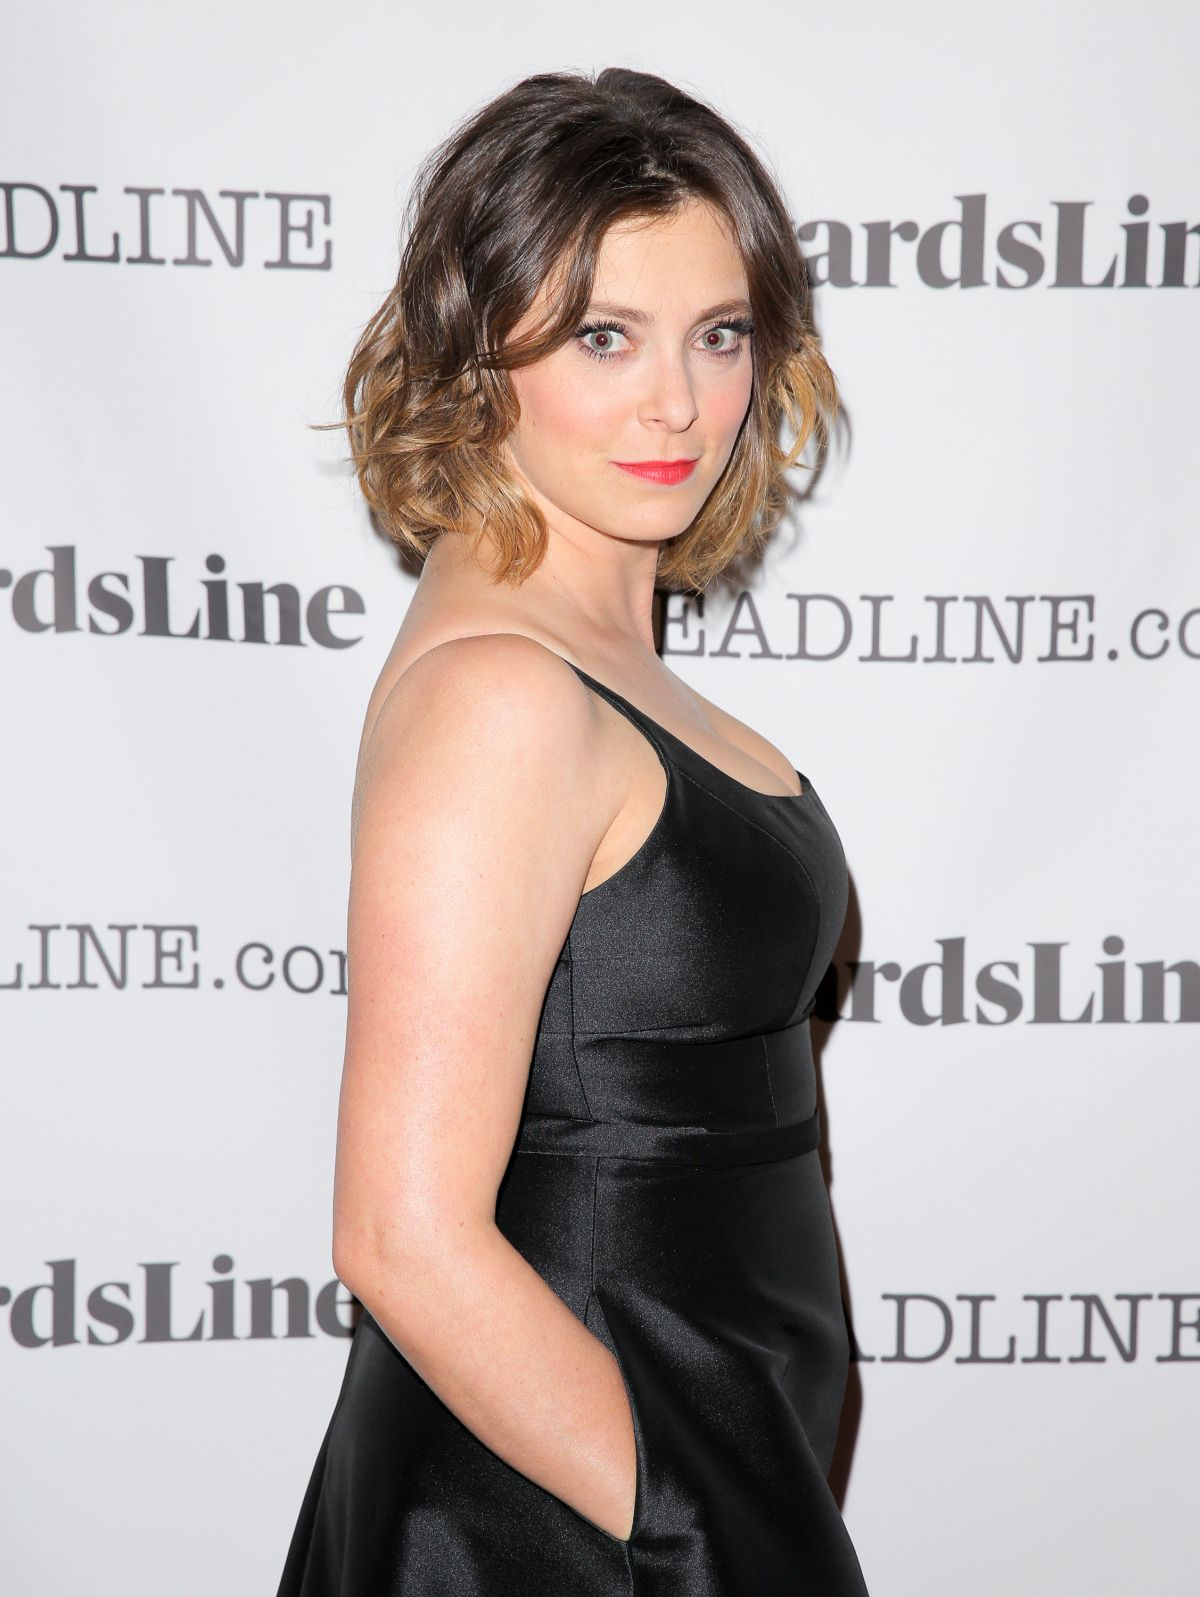 RACHEL BLOOM at Deadline Emmy Party in Los Angeles 06/08/2016